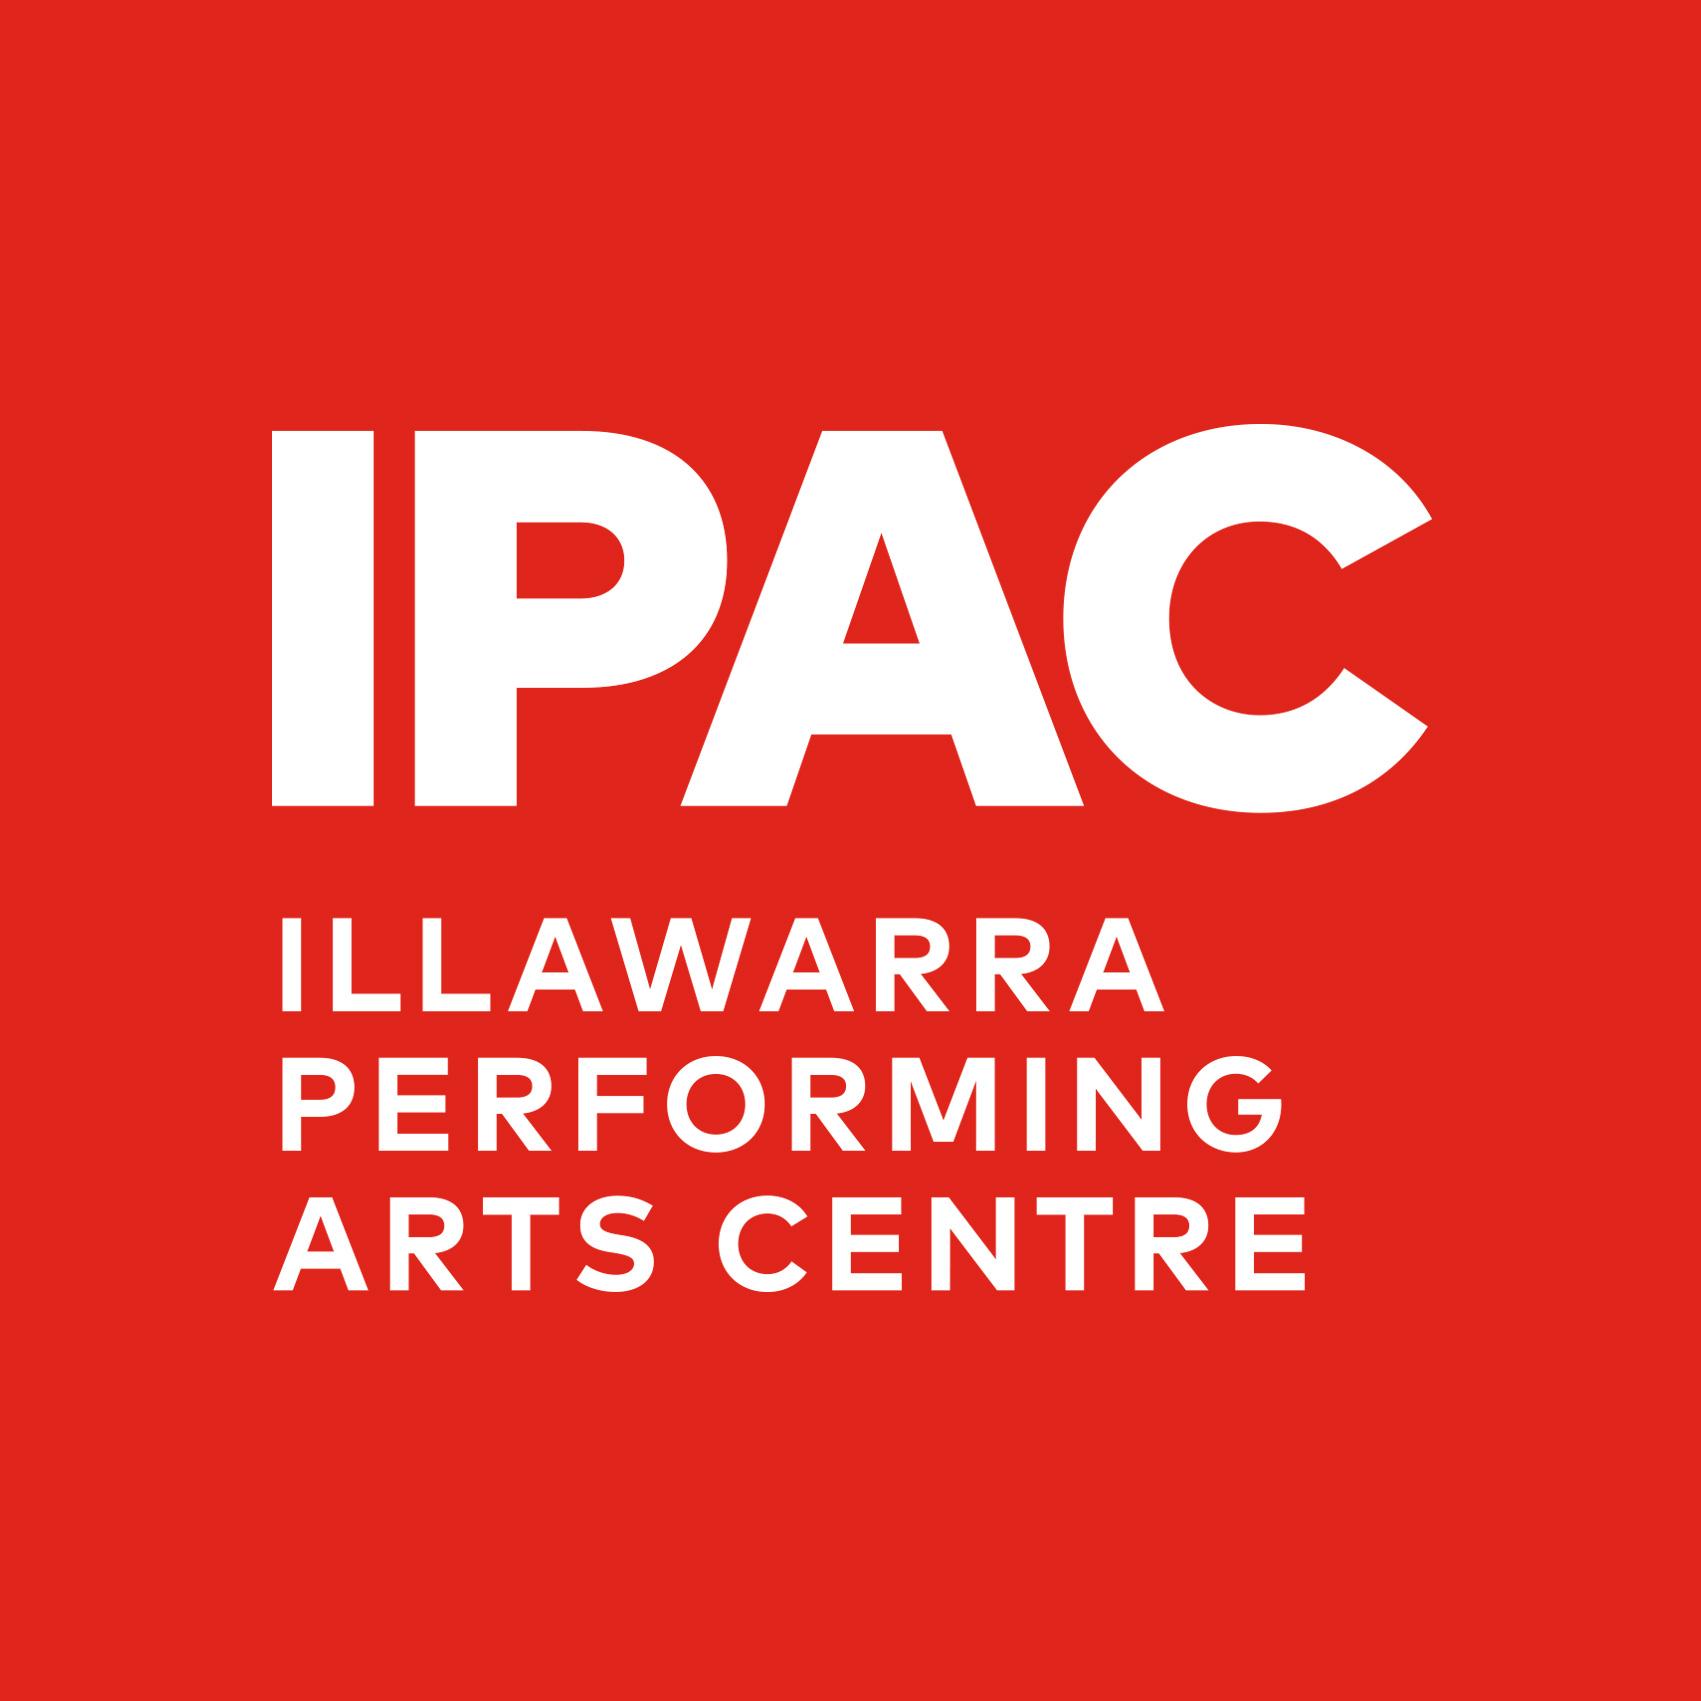 illawarra-performing-arts-centre-rebrand-logo-design-wollongong-graphic-design-.jpg